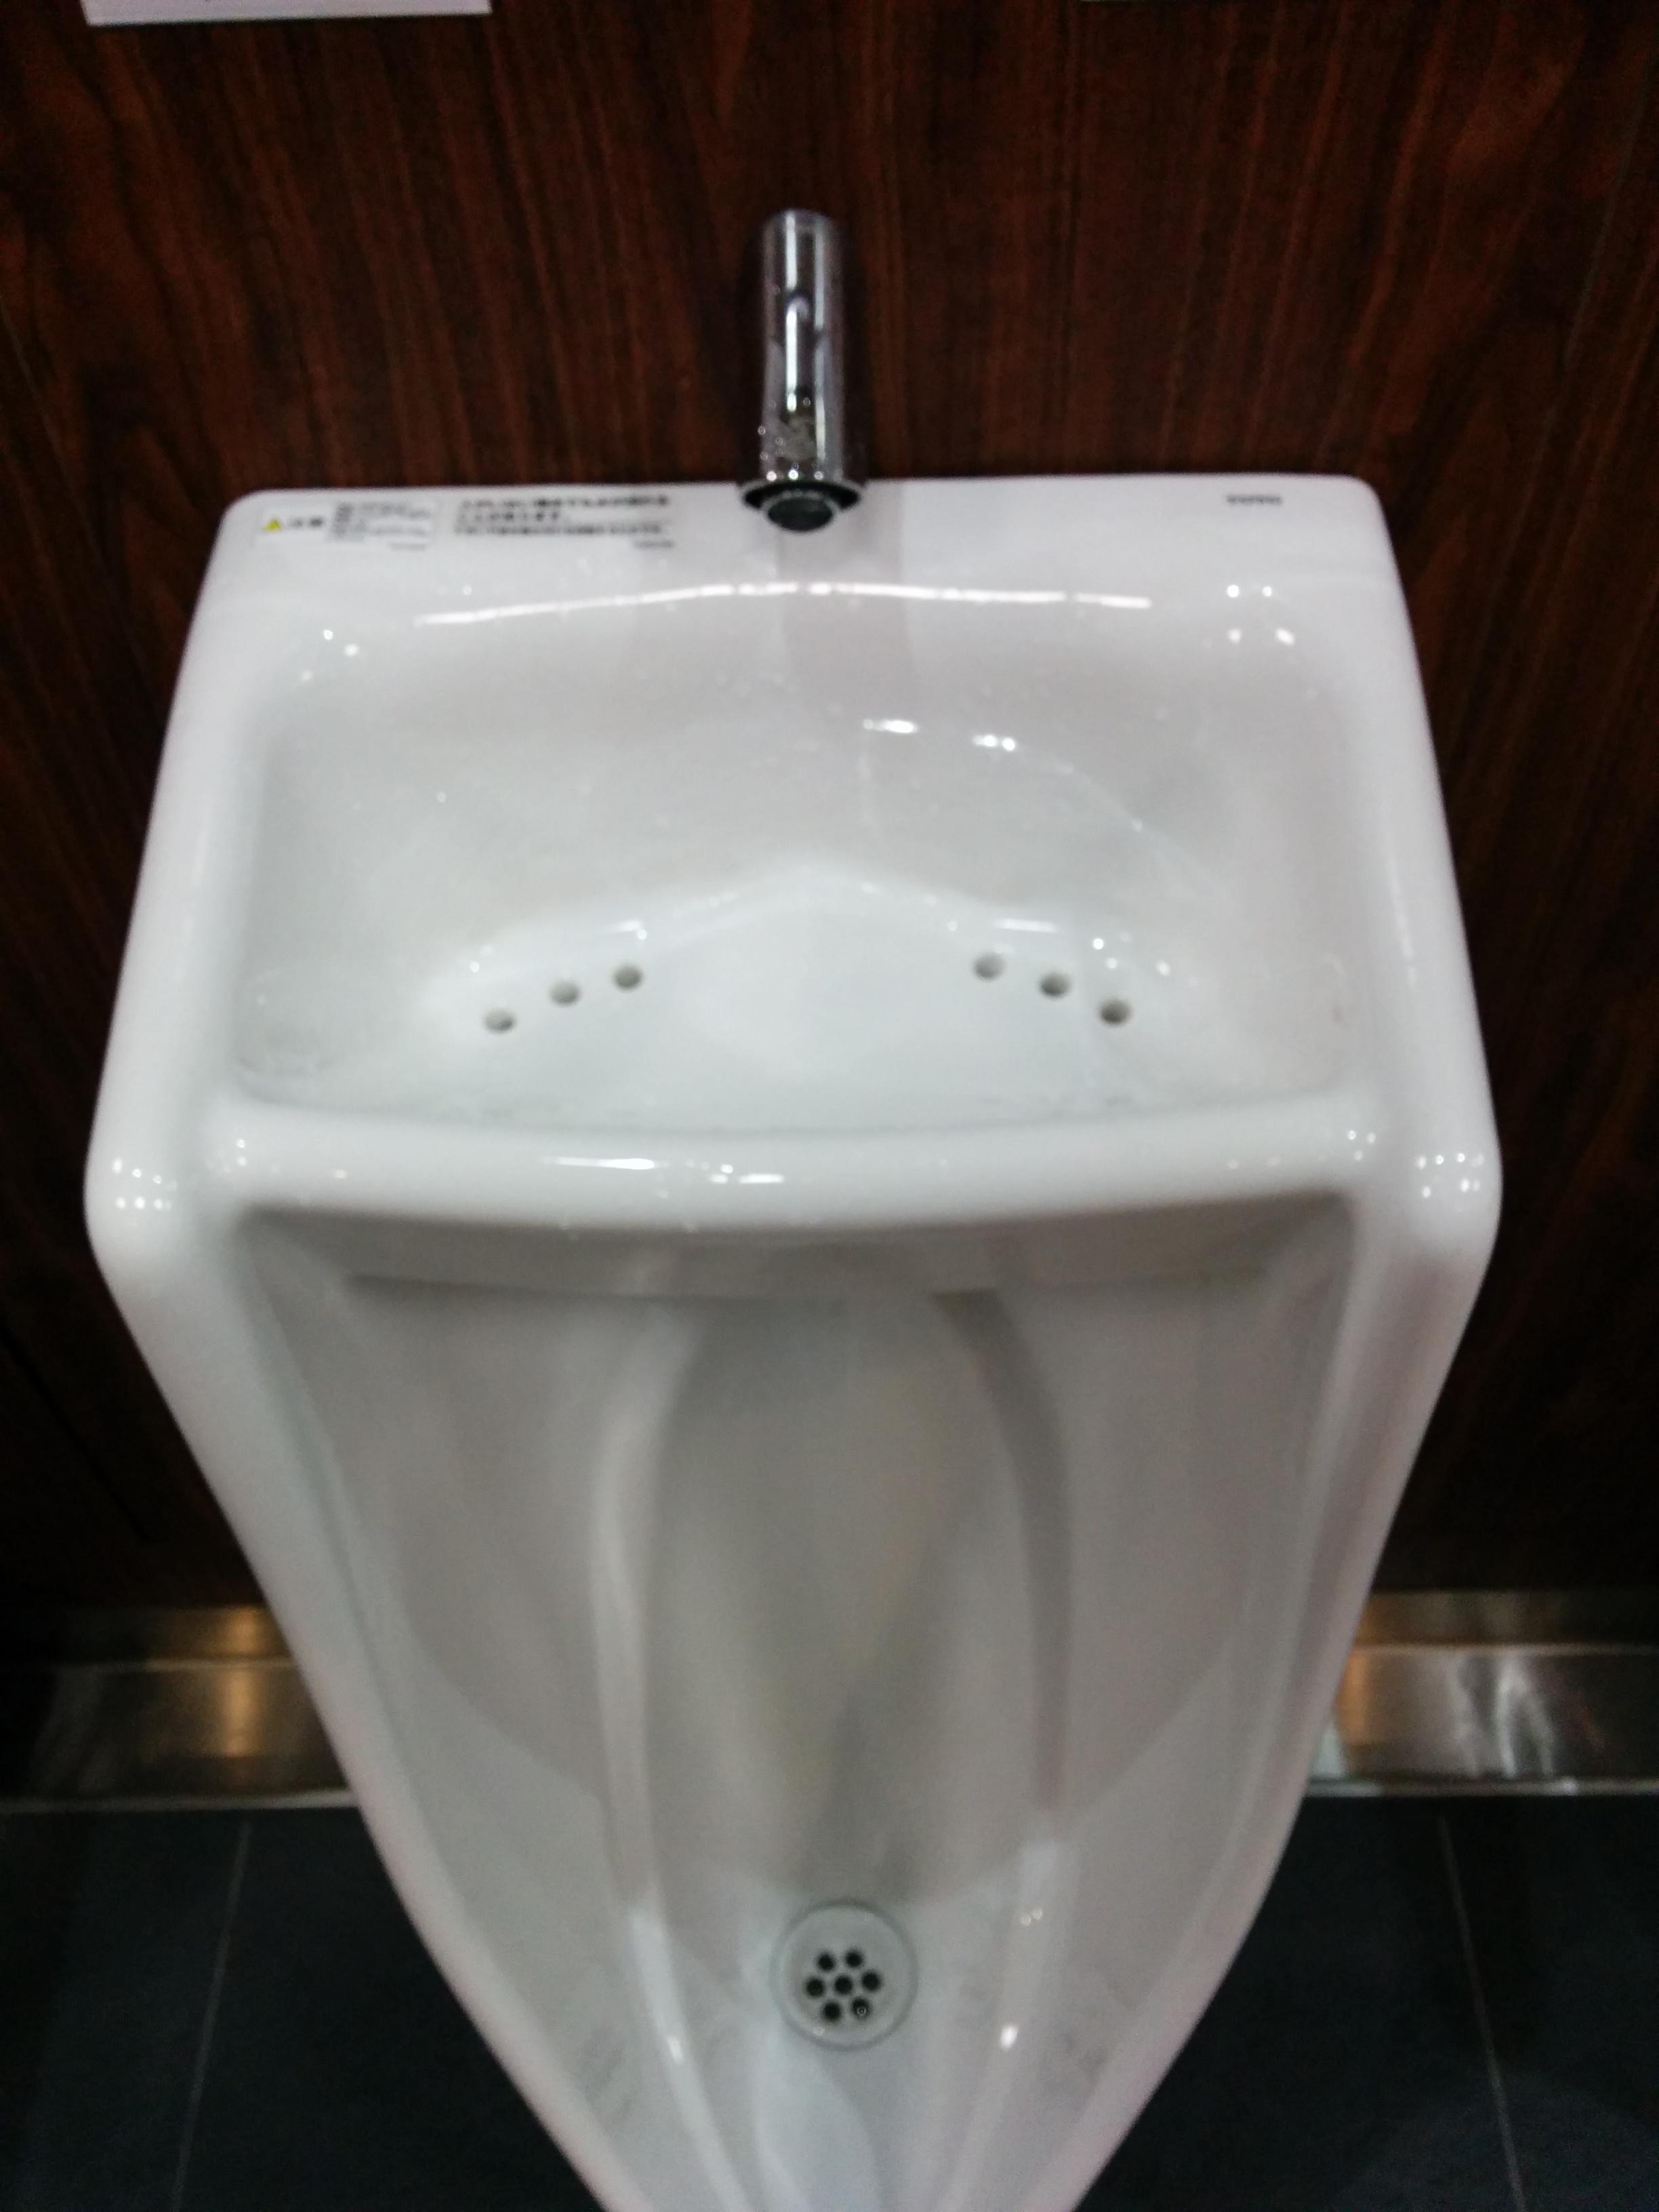 File:Hand Wash Sink on the Urinal in Mito-SA 2014.jpg - Wikimedia ...